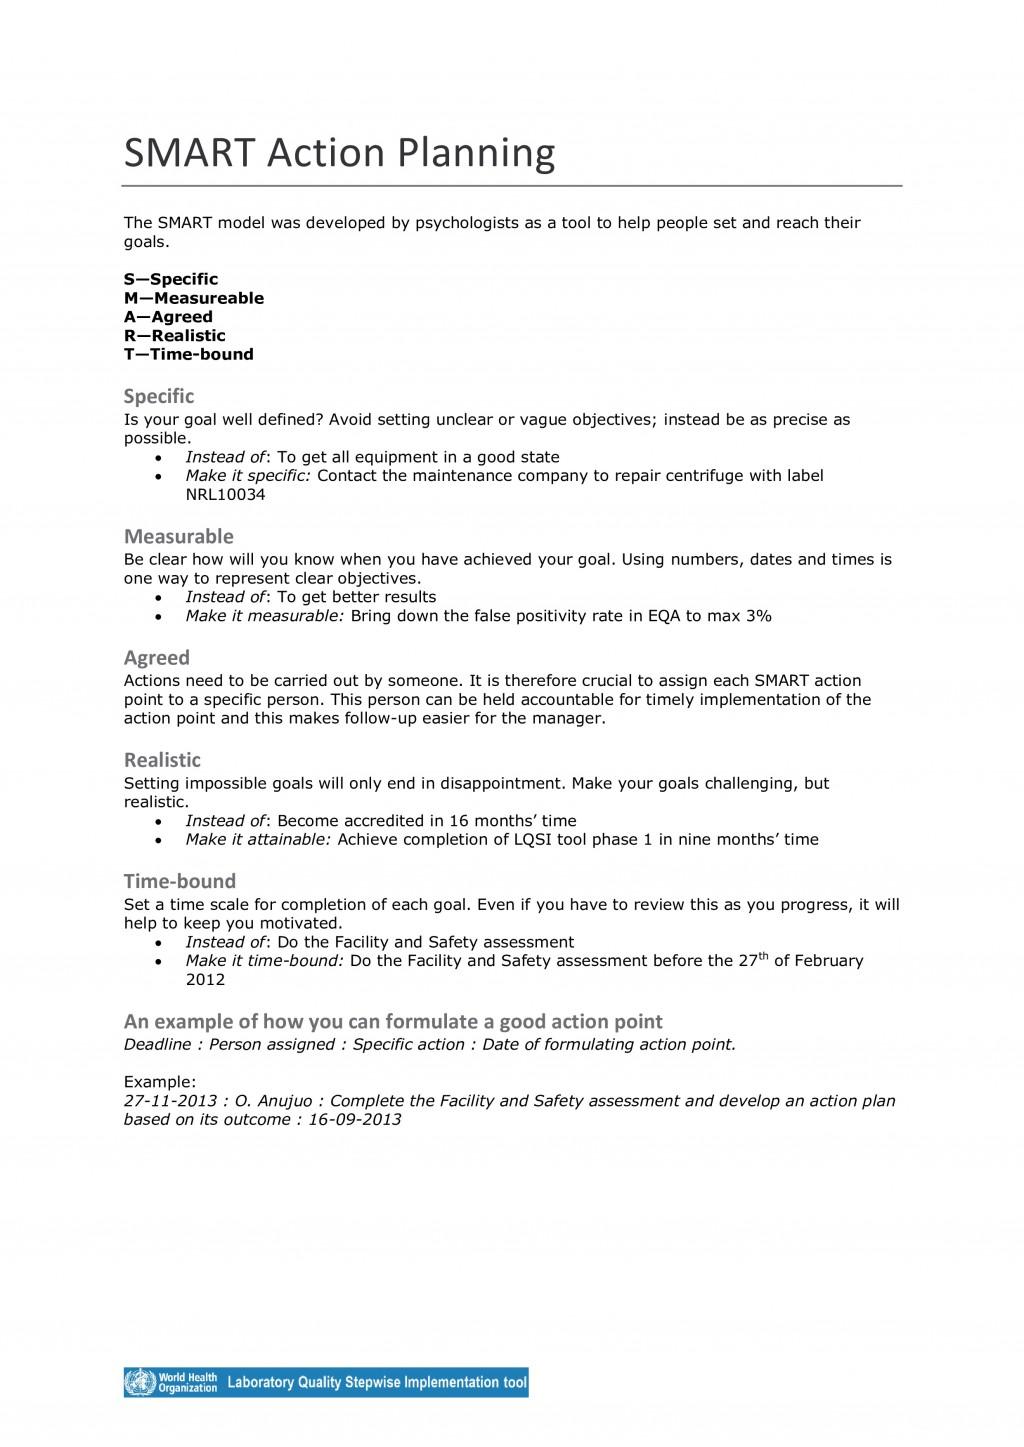 003 Sensational Smart Action Plan Template Example  Nh Download NursingLarge